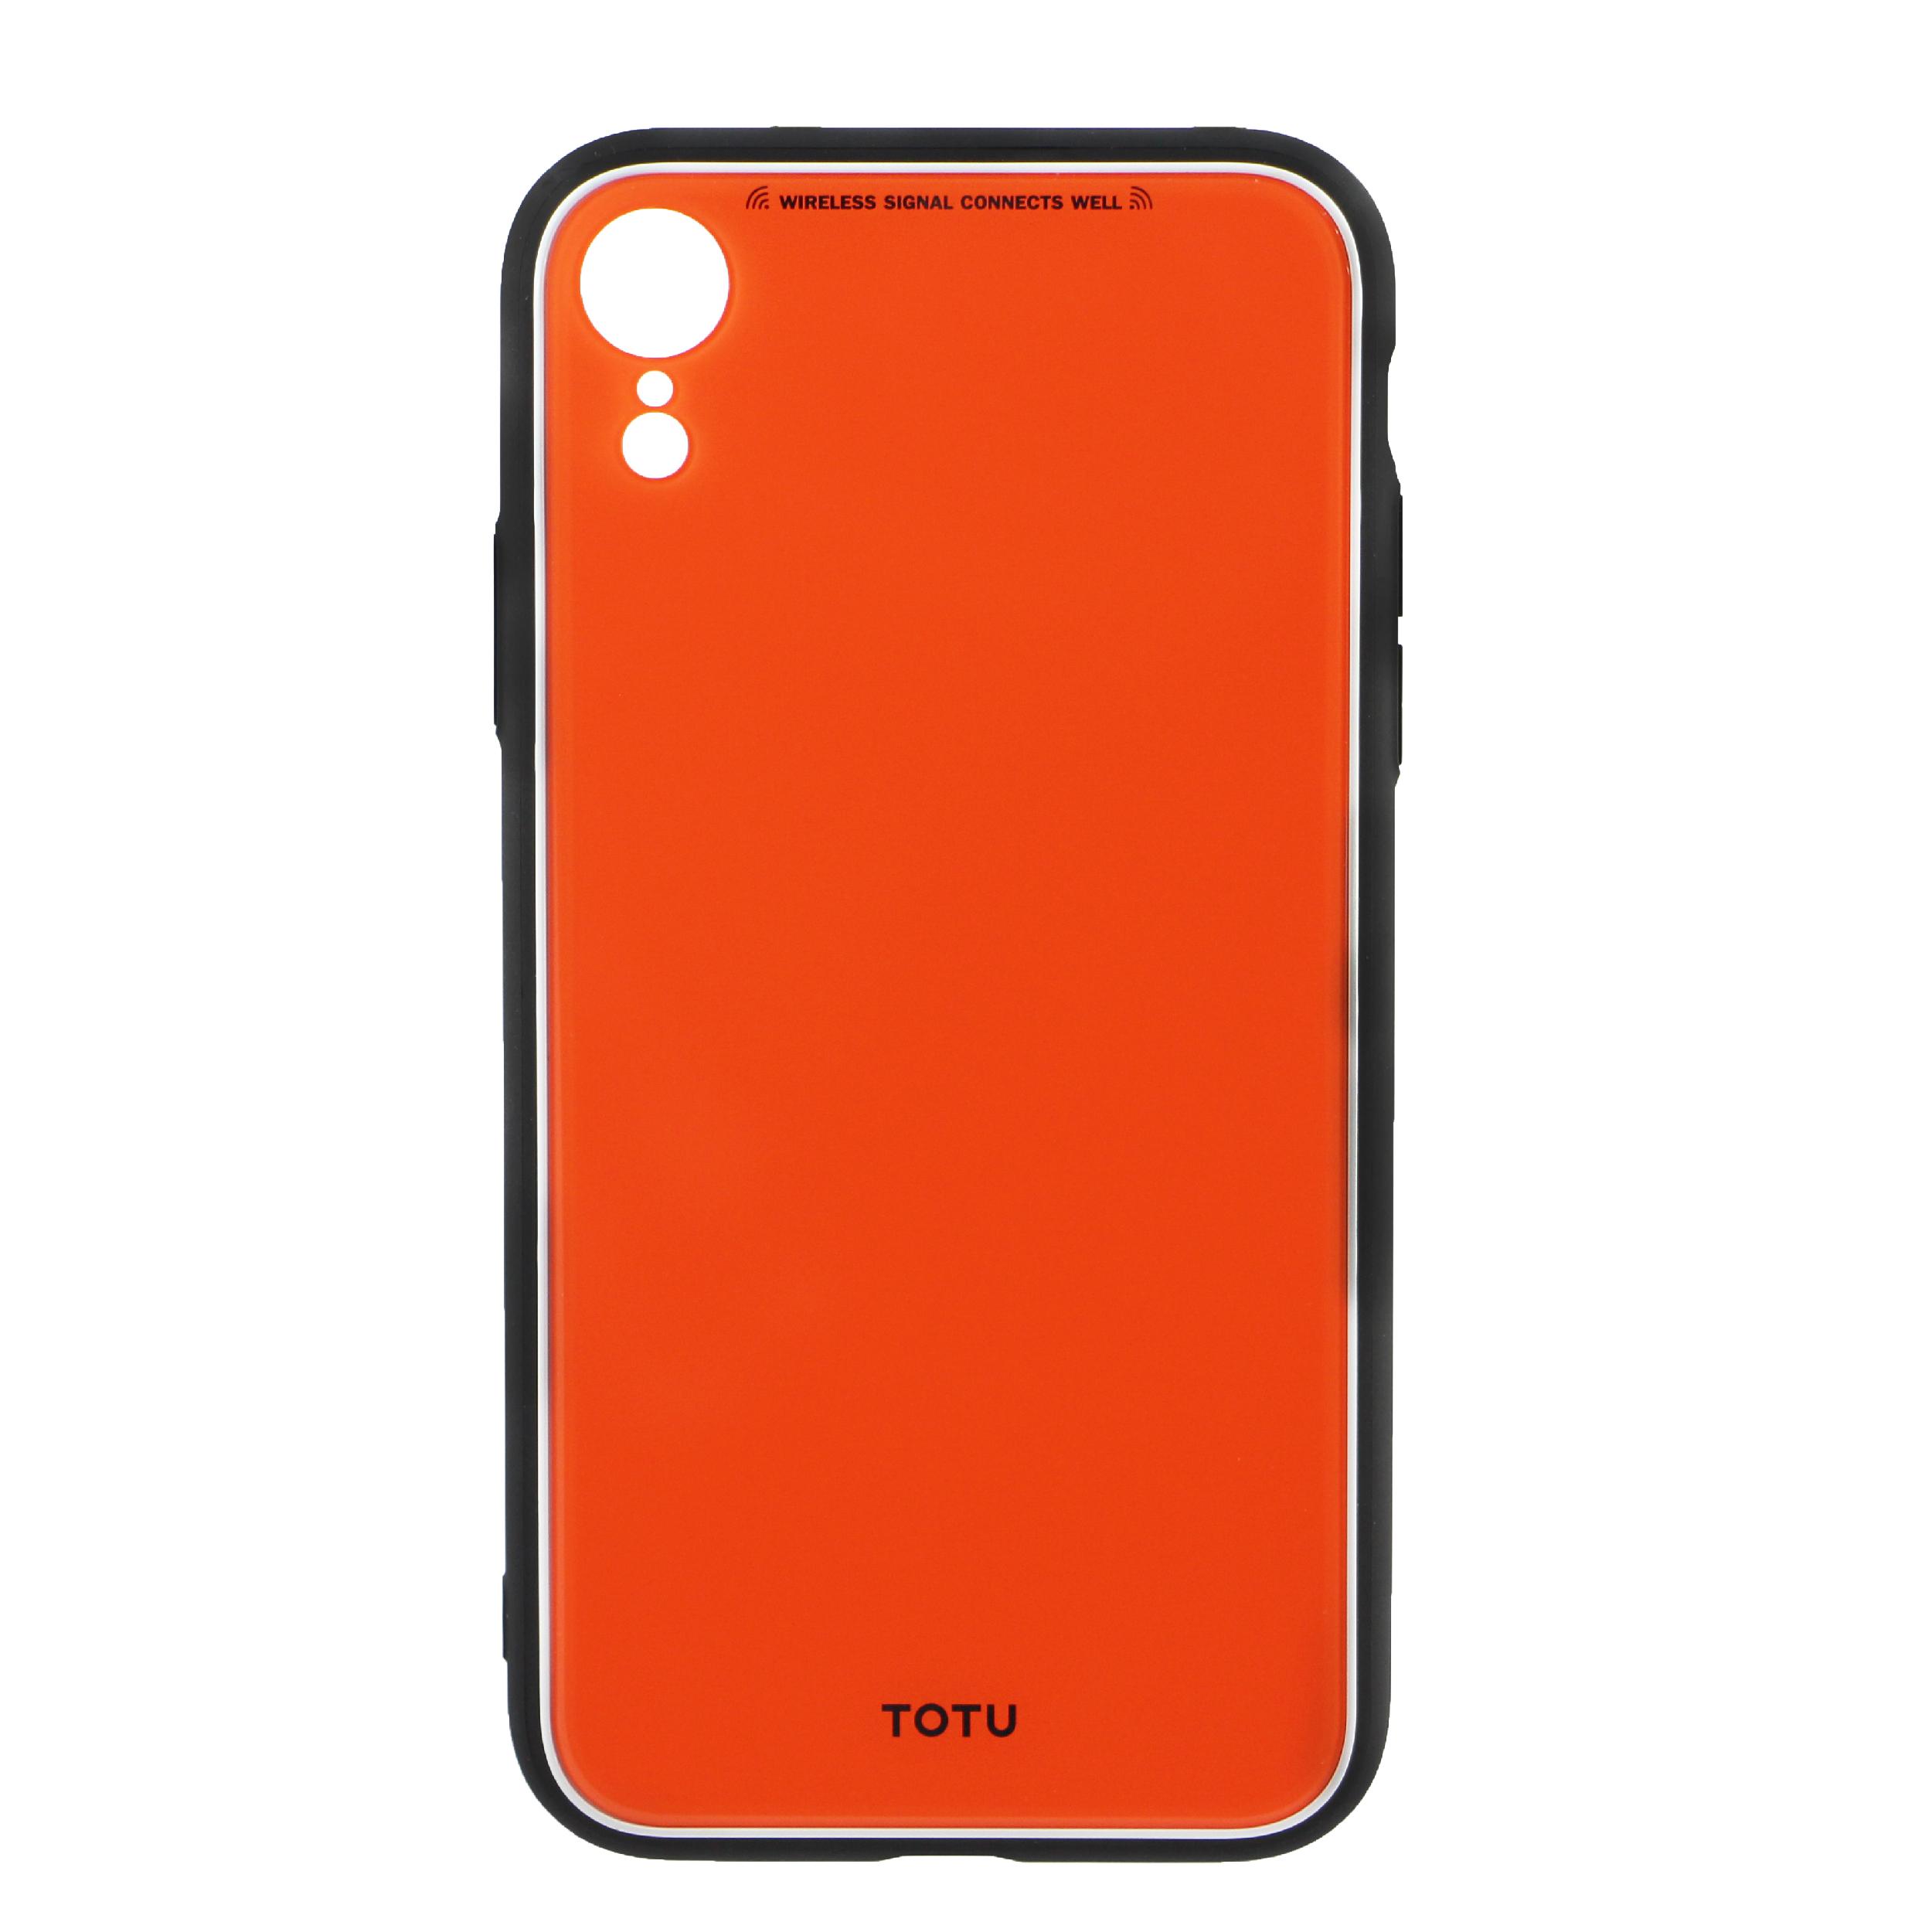 کاور توتو مدل STYLE 007 مناسب برای گوشی موبایل اپل iPhone XR